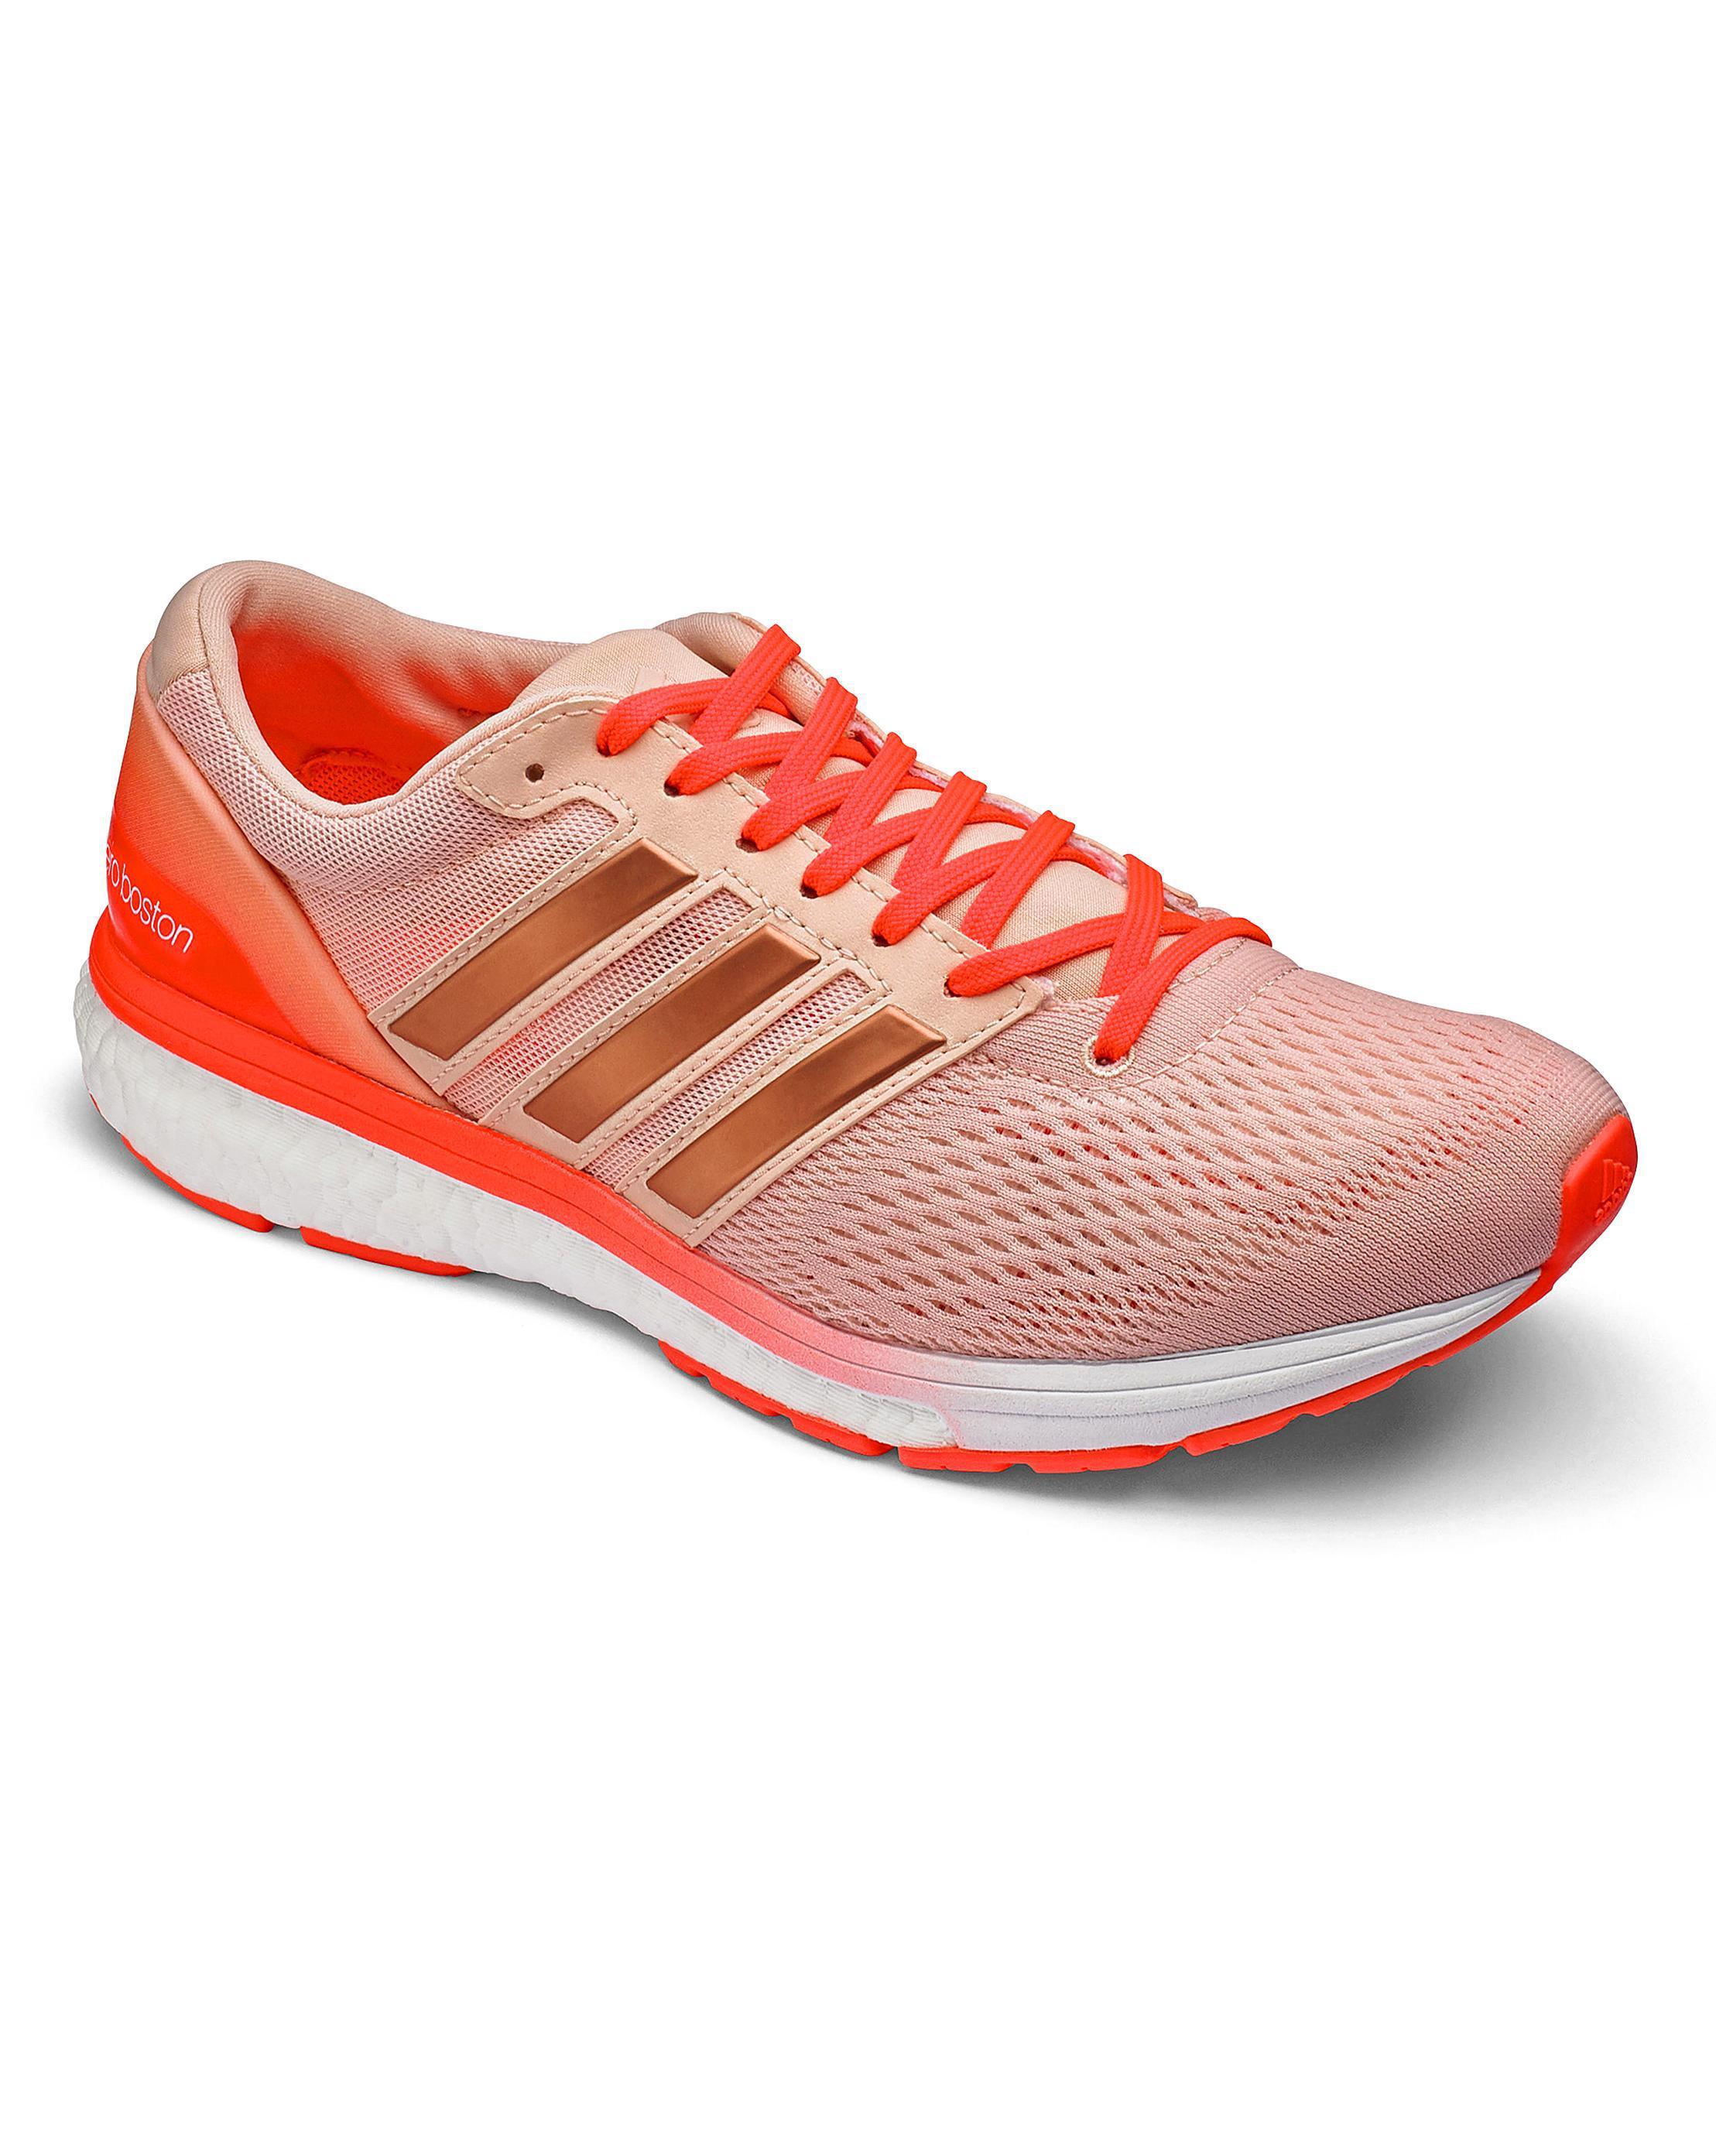 Lyst - Simply Be Adidas Adizero Boston 6 Women s Sneakers in Pink 8b2ac9880